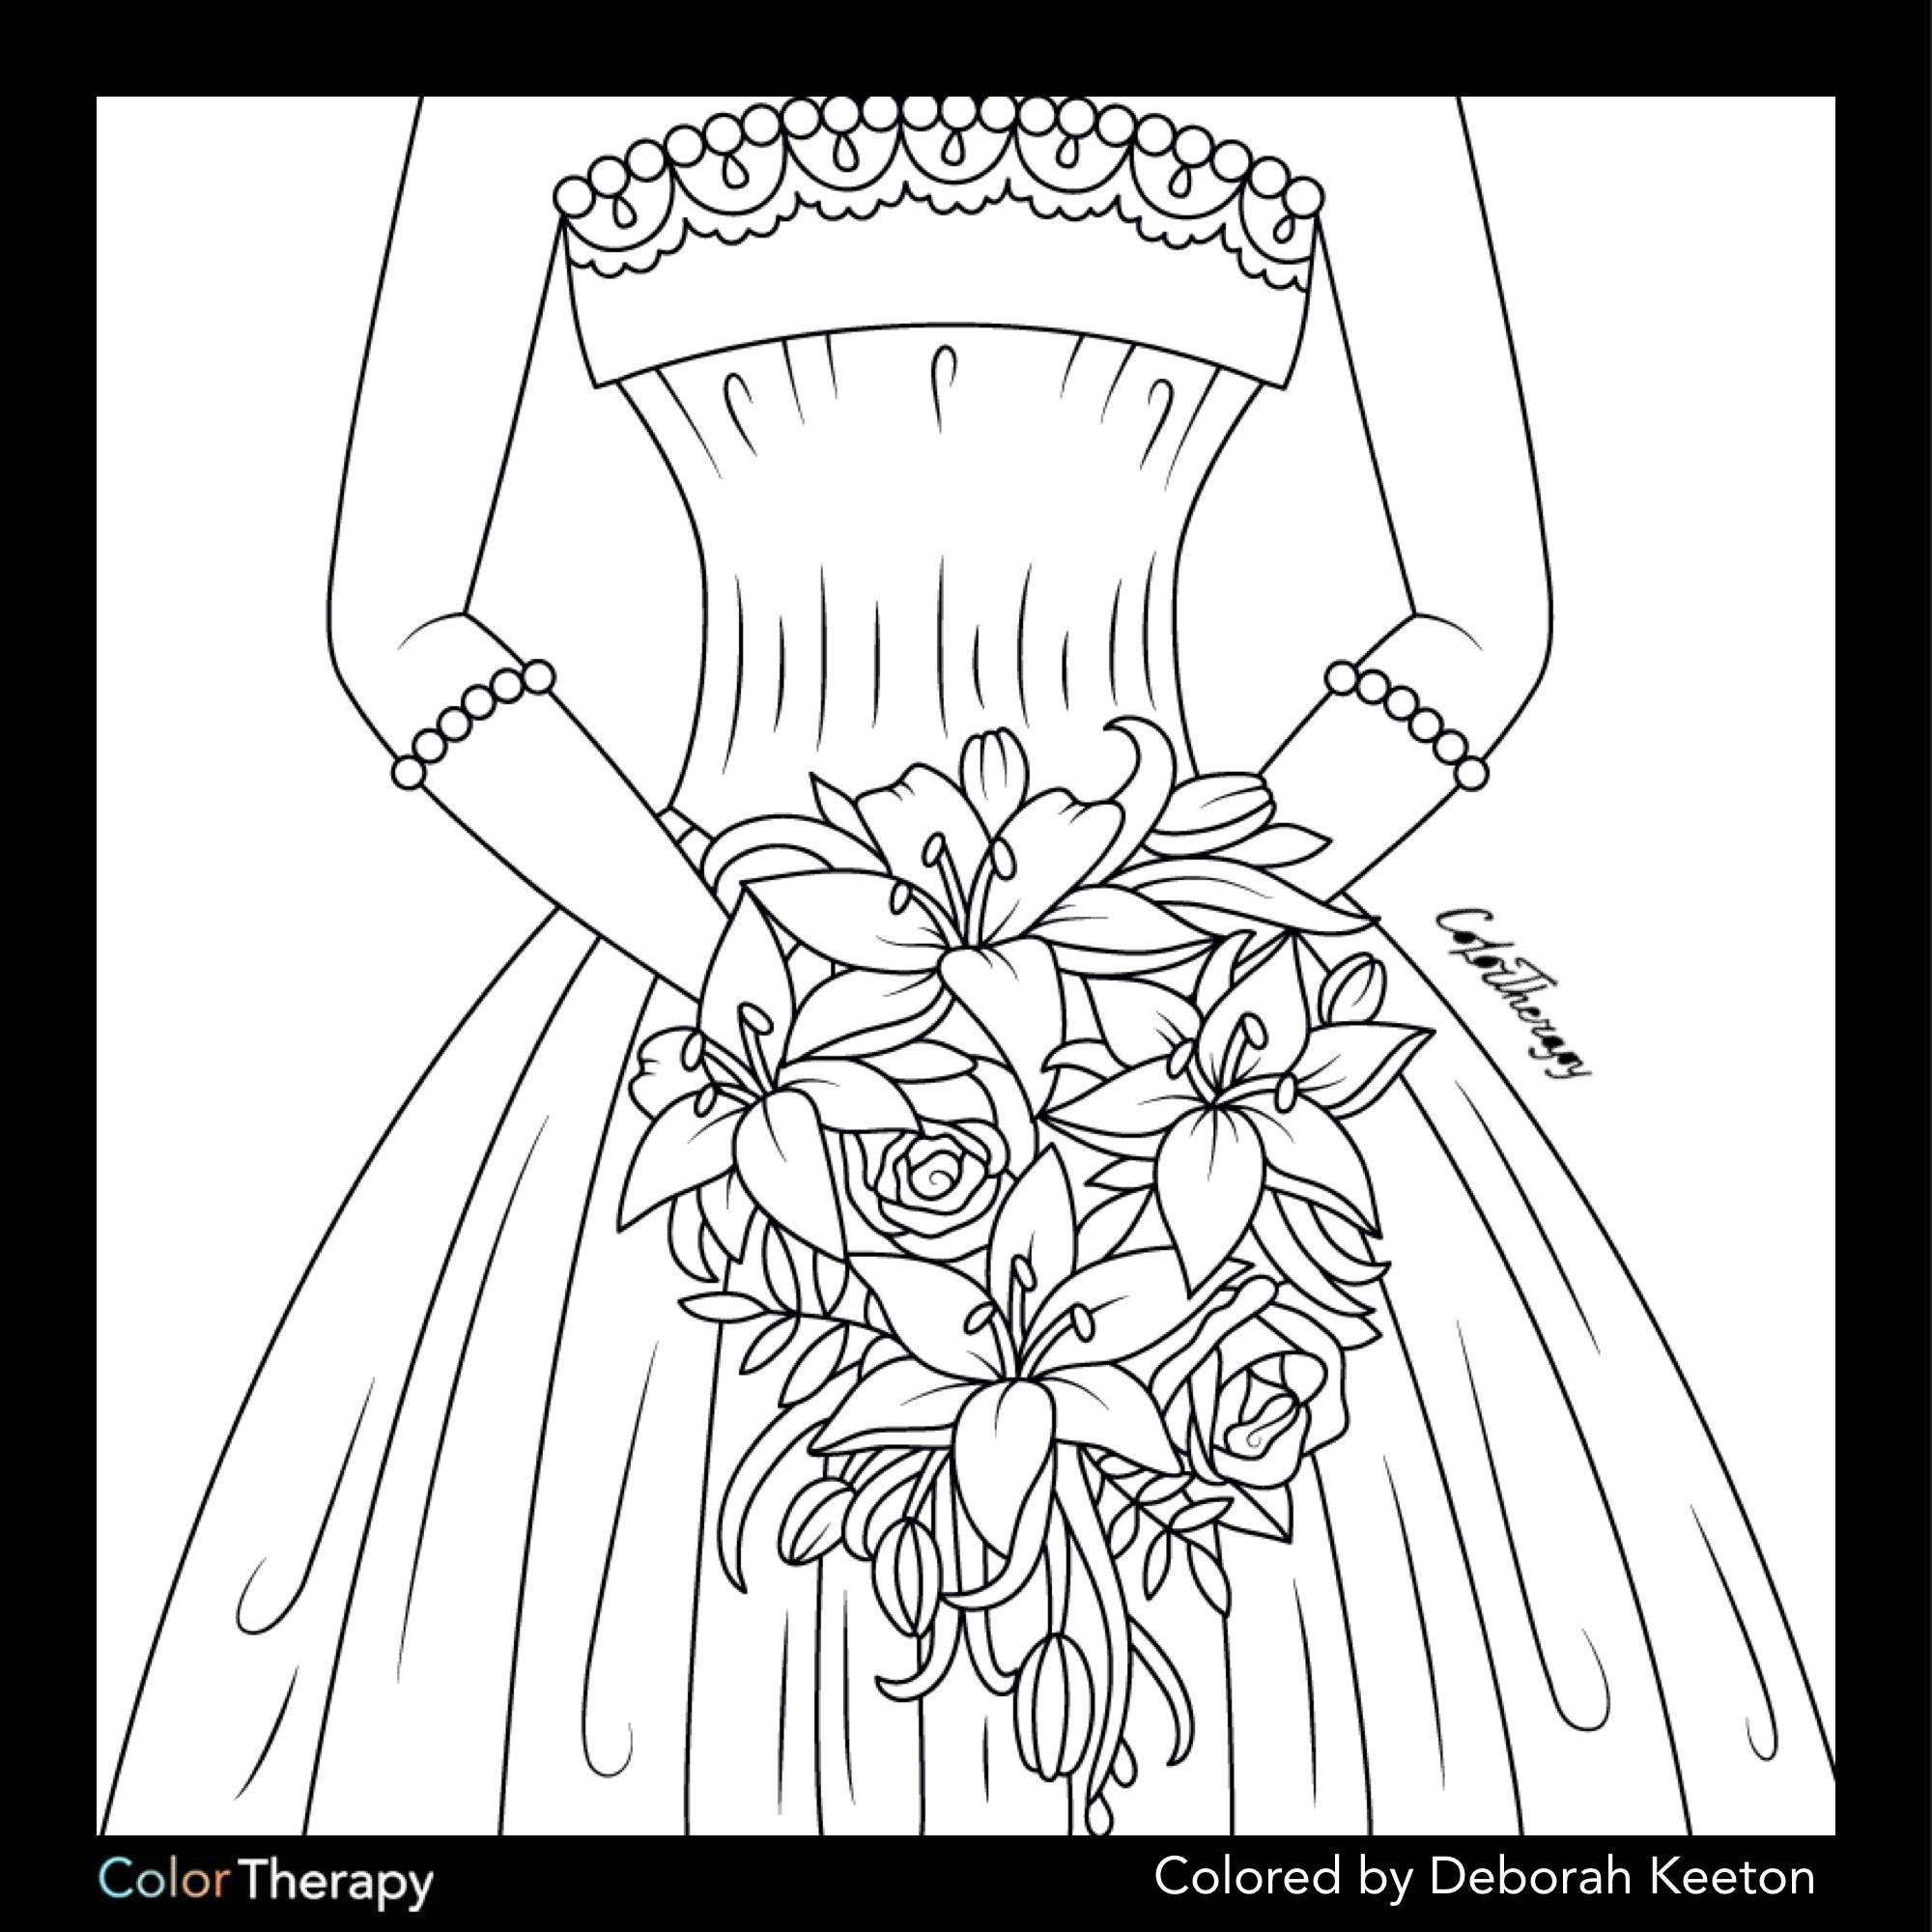 Pin de Deborah Keeton en Coloring pages | Pinterest | Dibujo